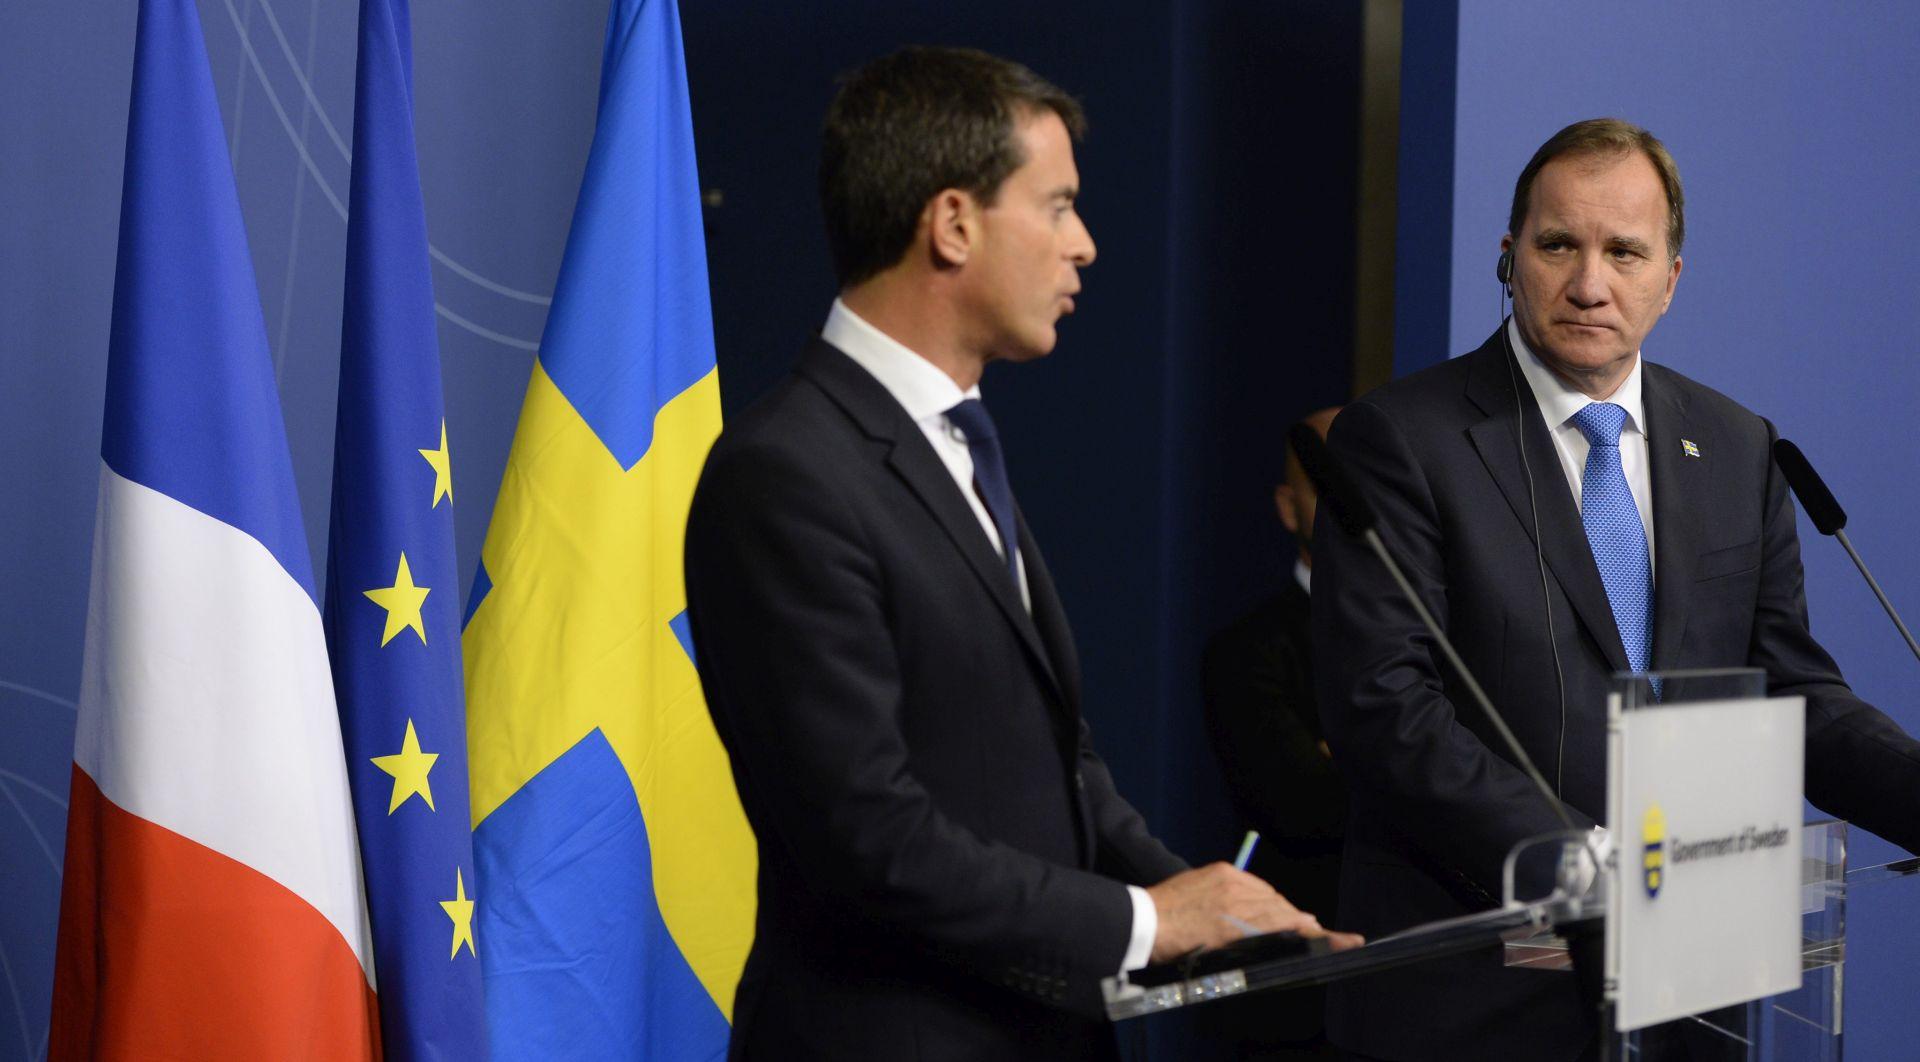 Švedska vlada pred velikim humanitarnim izazovom